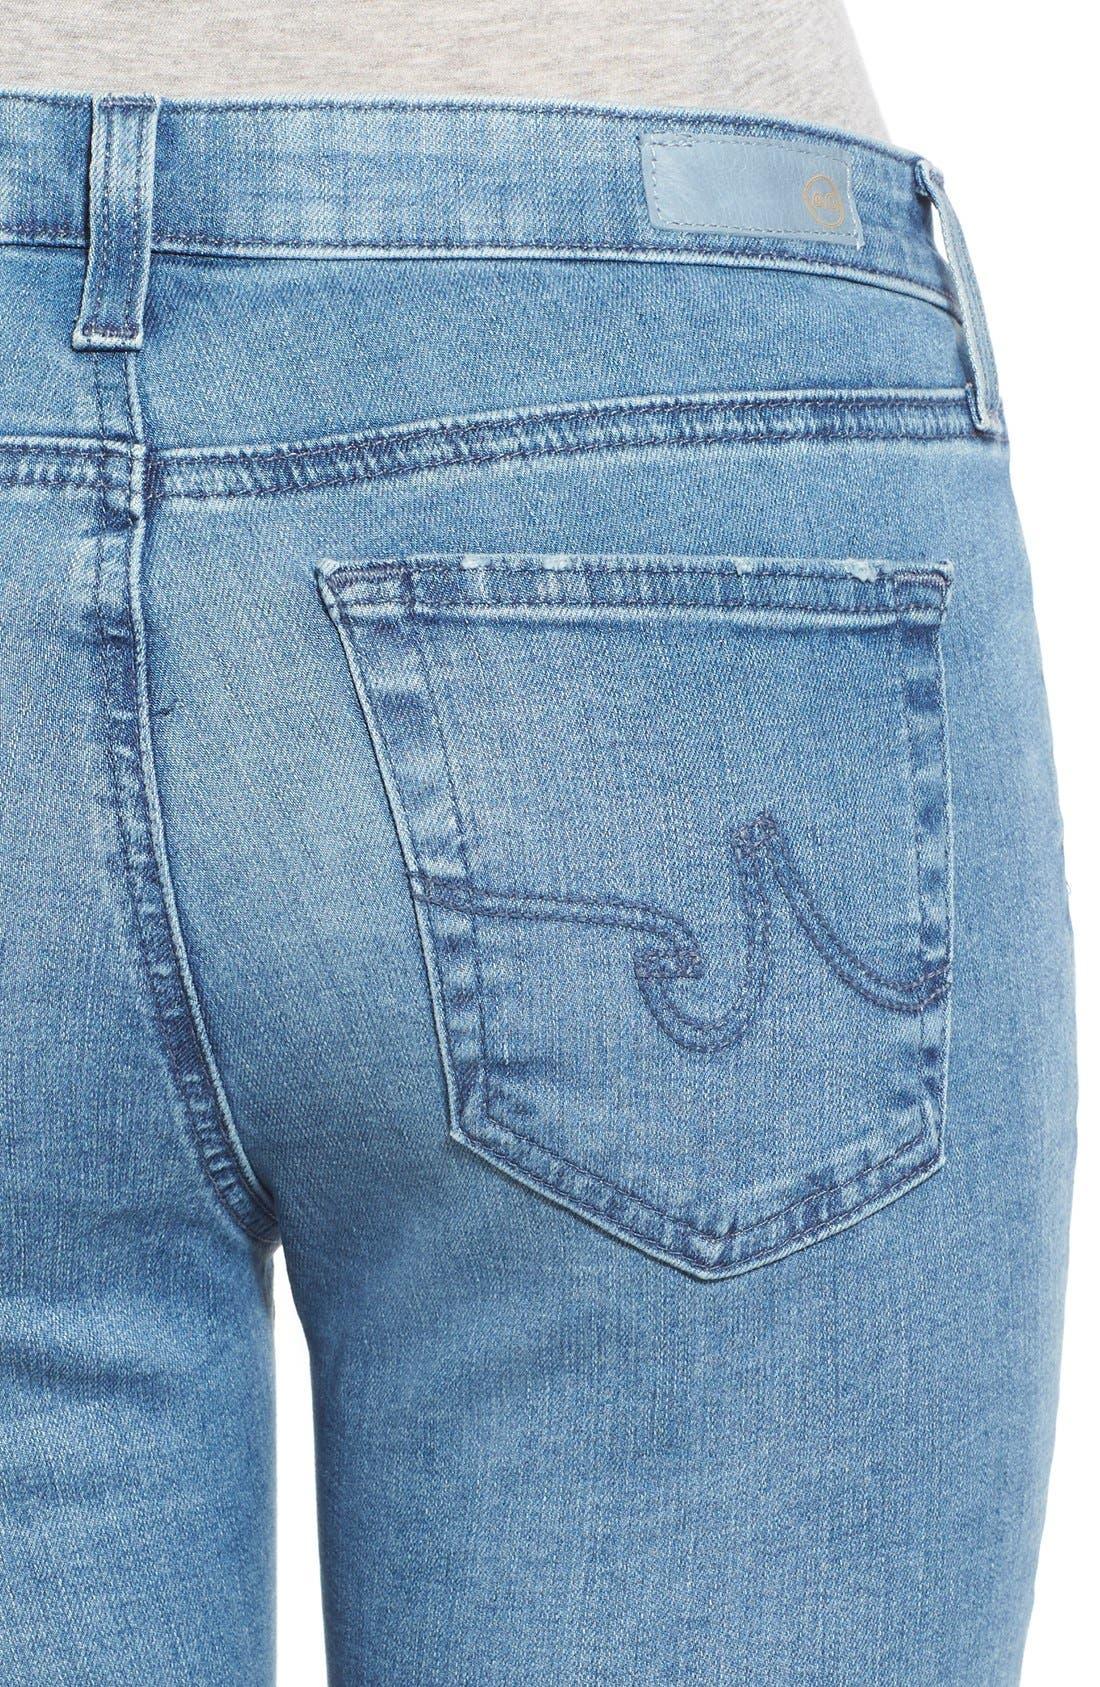 Alternate Image 4  - AG 'Middi' Ankle Skinny Jeans (15 Year LiberatingBeat)